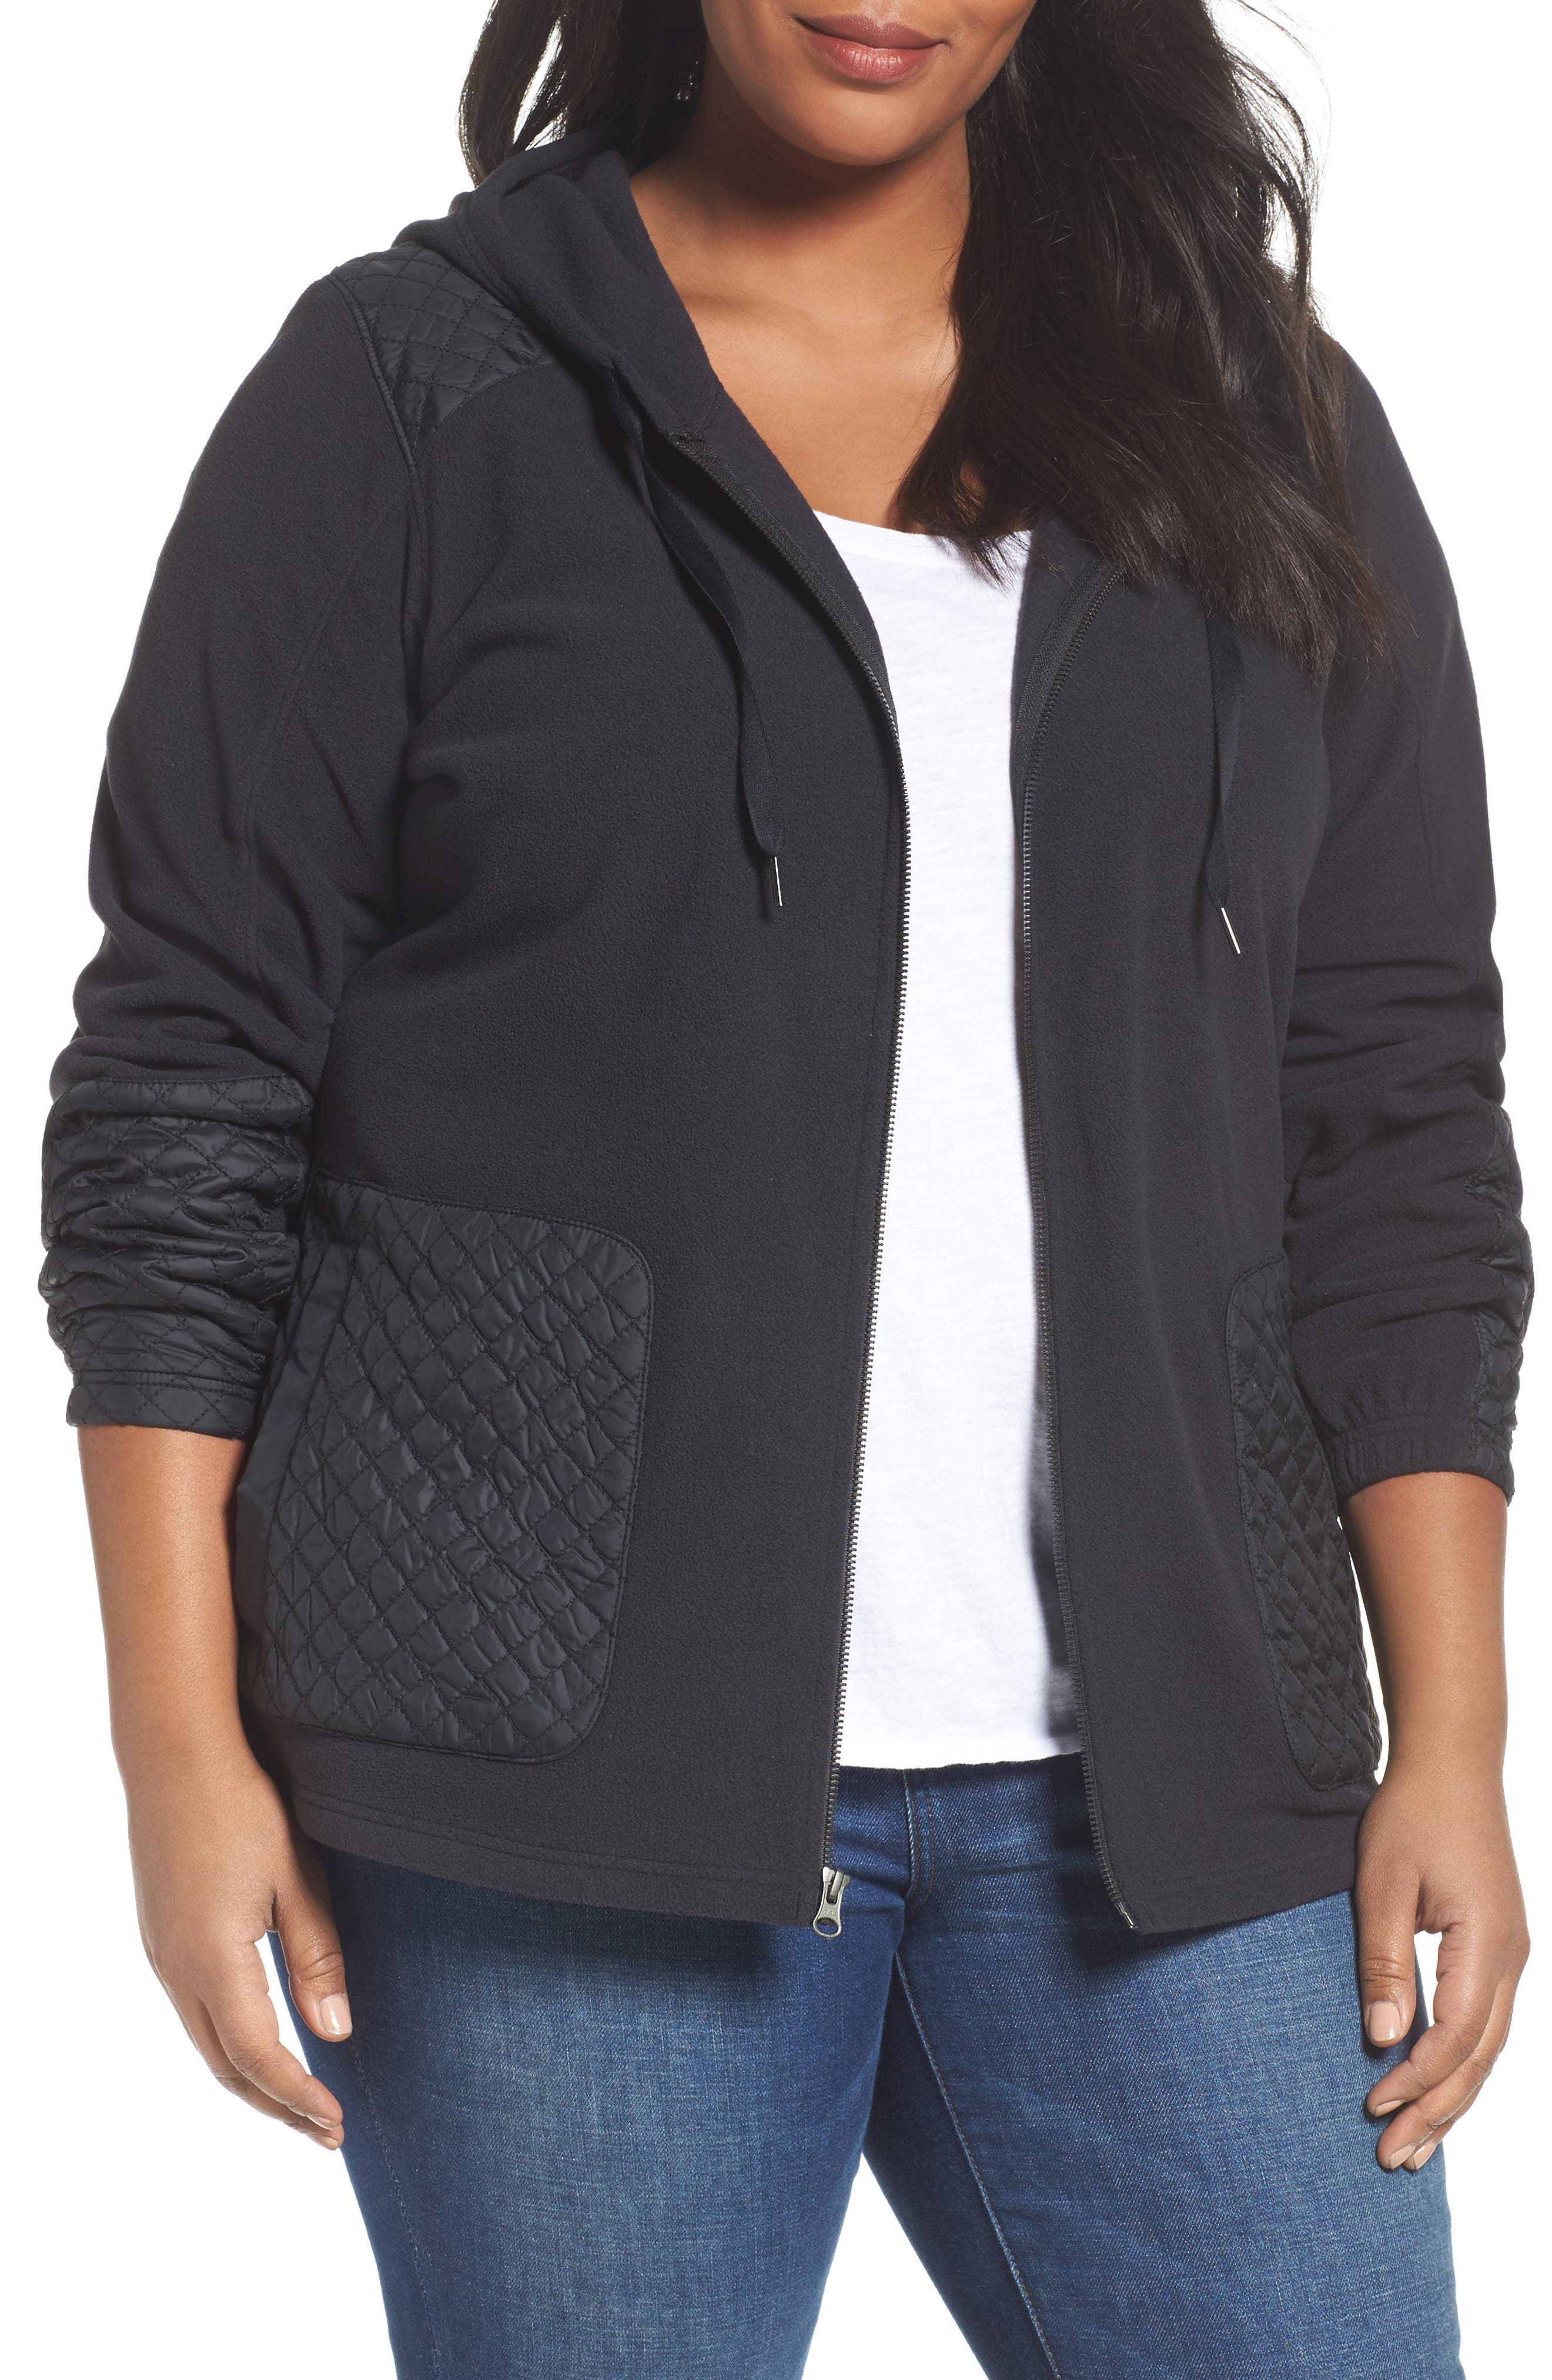 Warm Up Hooded Fleece Jacket,                         Main,                         color, 010